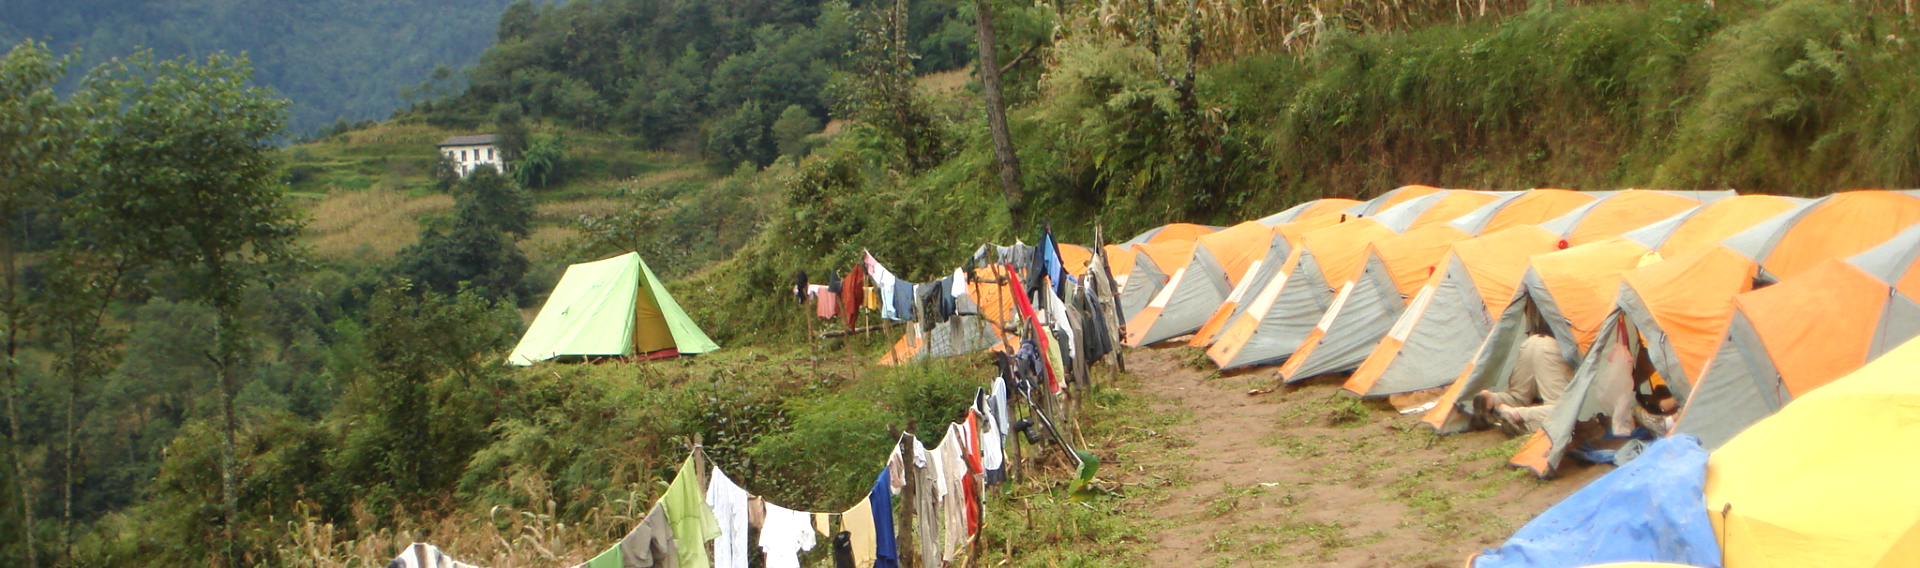 Camping Trek in Nepal